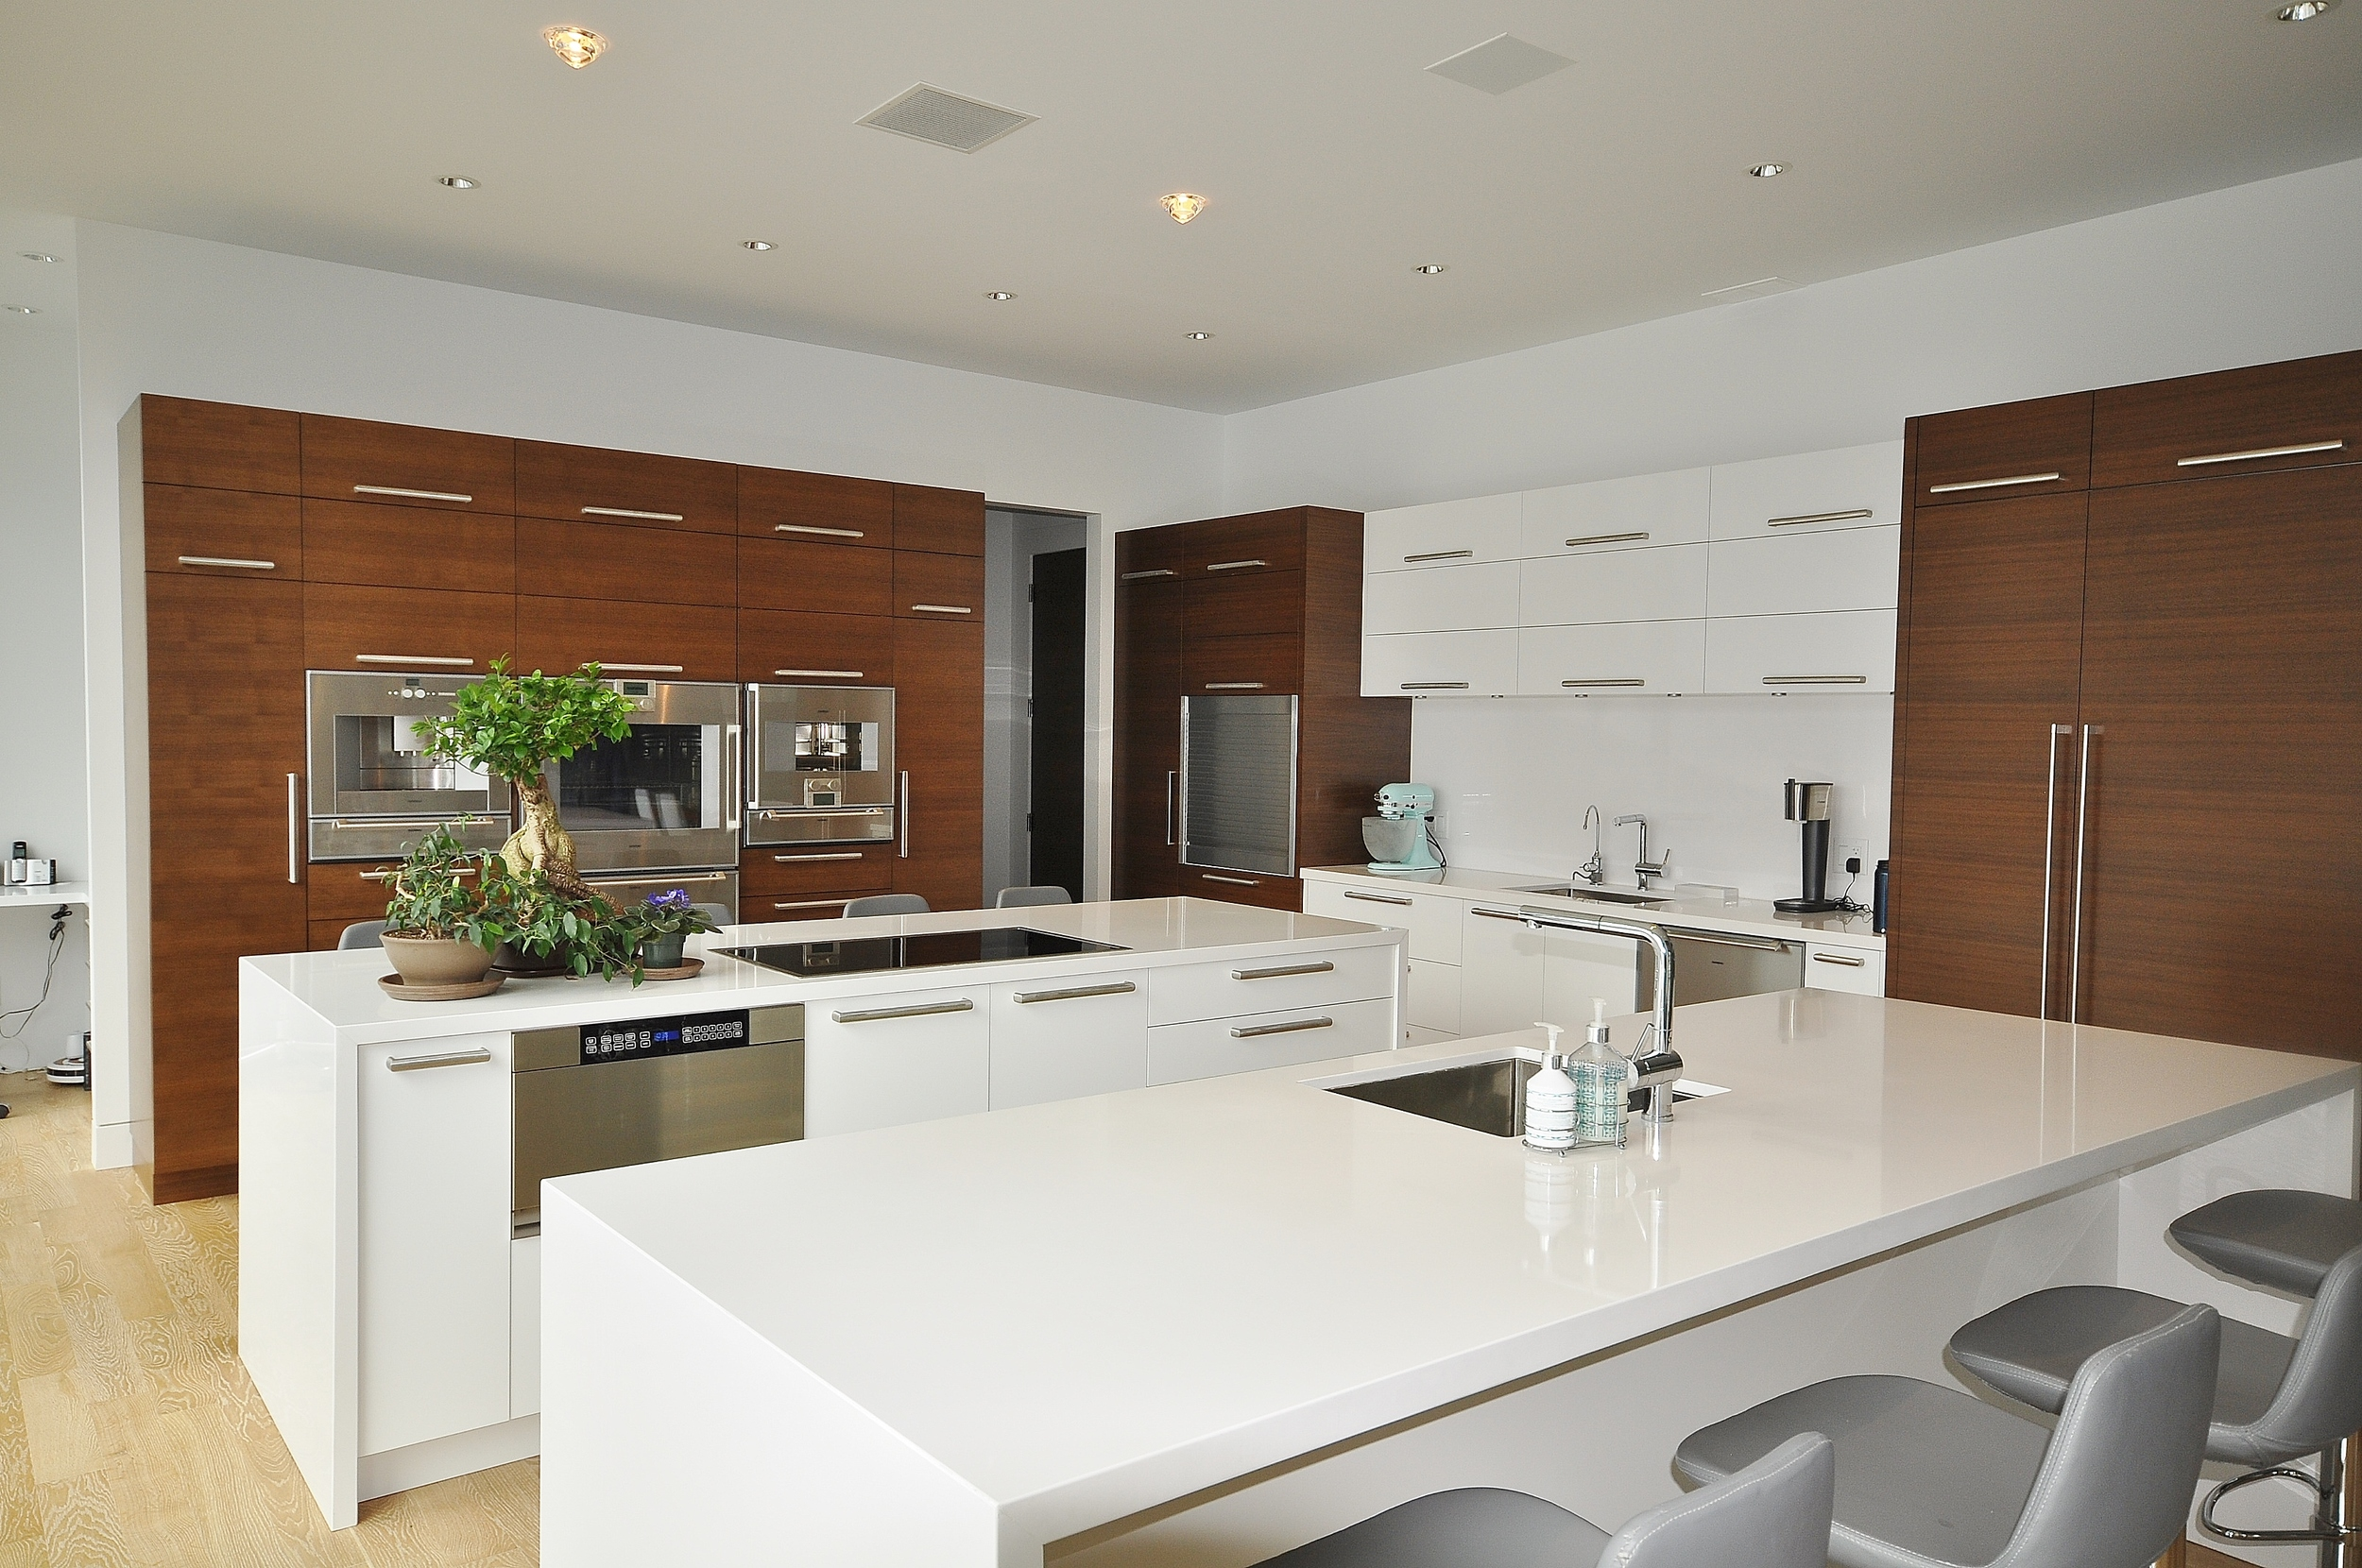 modern-walnut-high-gloss-white-kitchen-cabinetry.JPG